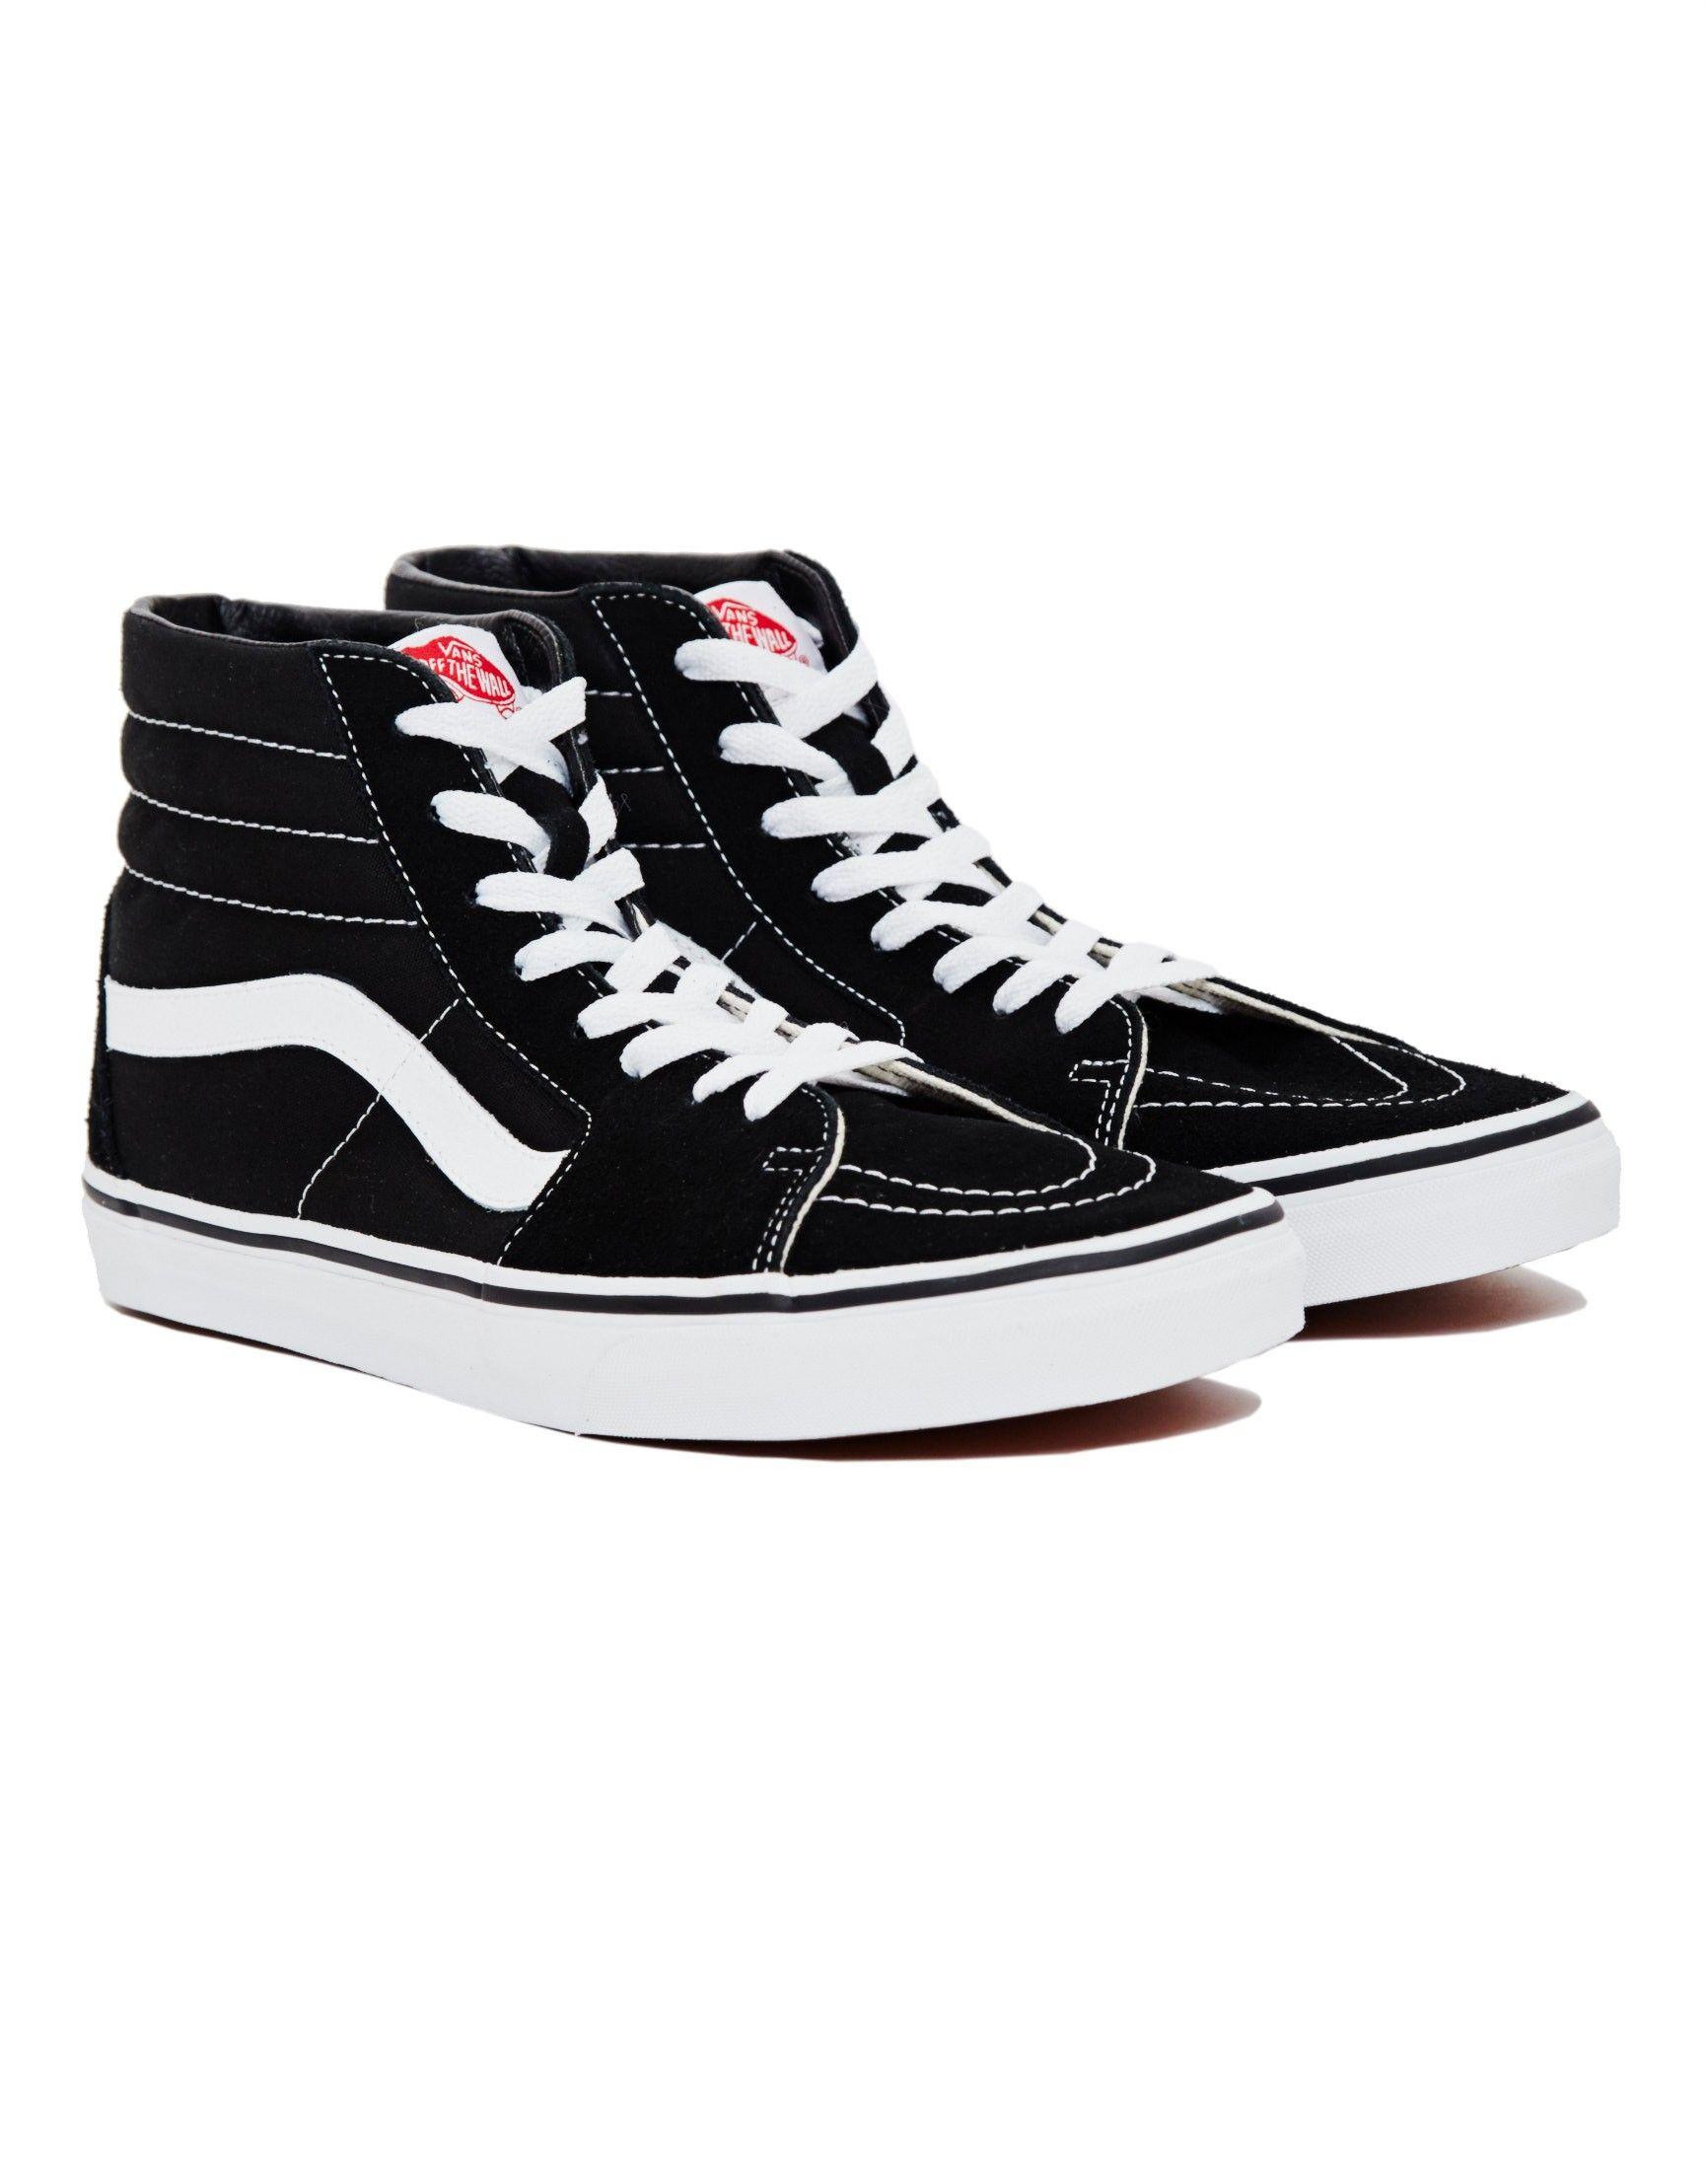 Vans - Sk8-Hi Trainers Black | How to lace vans, Cool mens ...